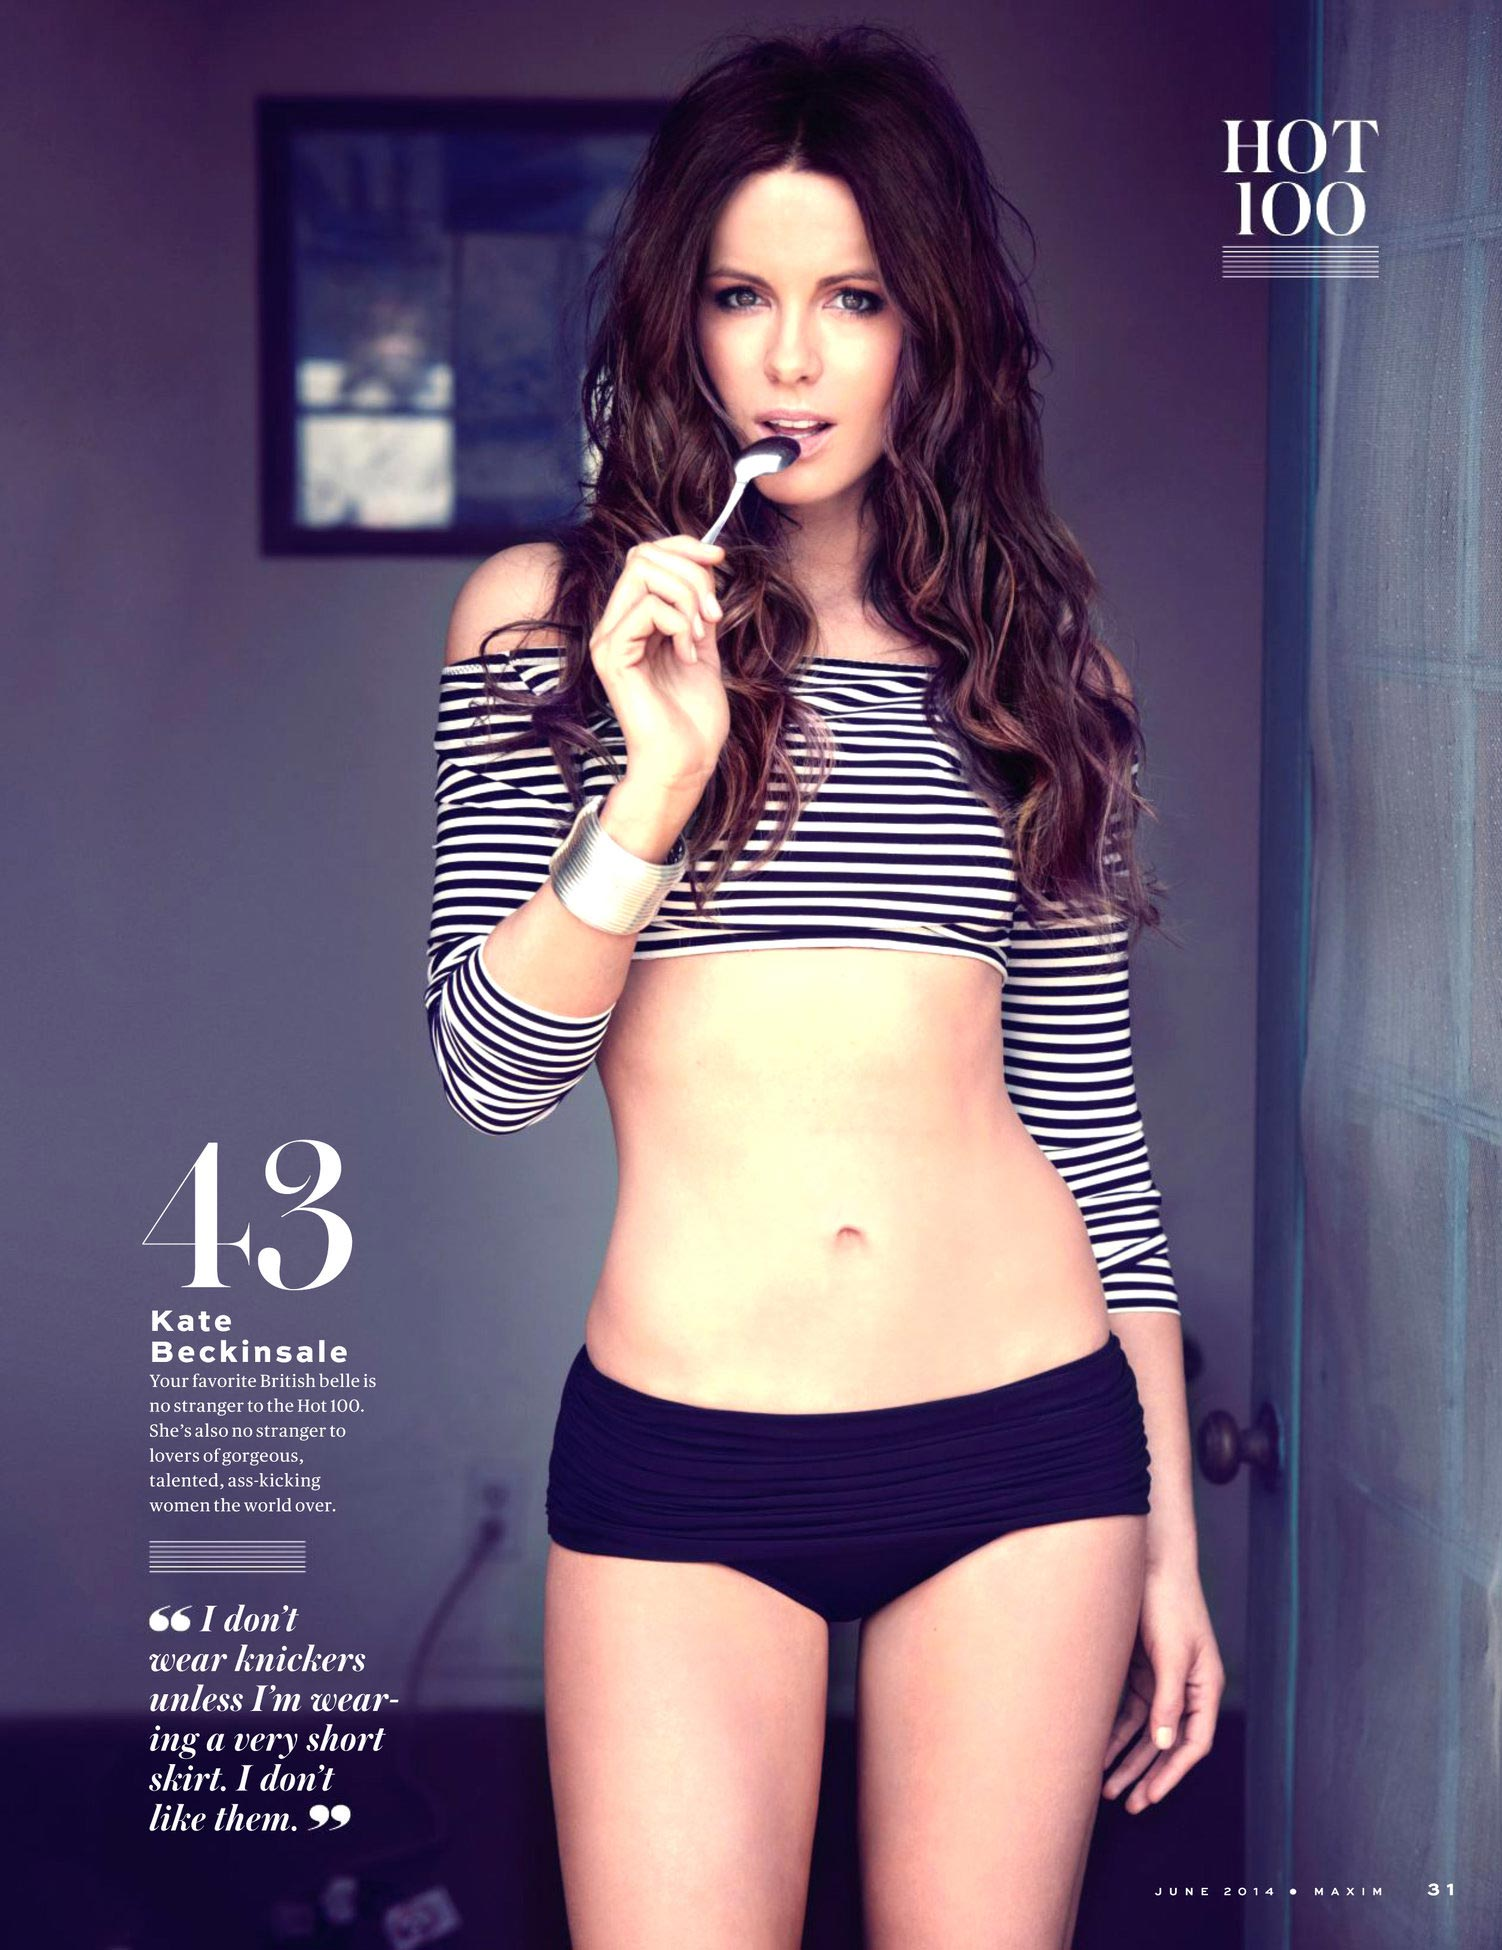 ICloud Kate Beckinsale nudes (82 photos), Topless, Hot, Instagram, underwear 2018